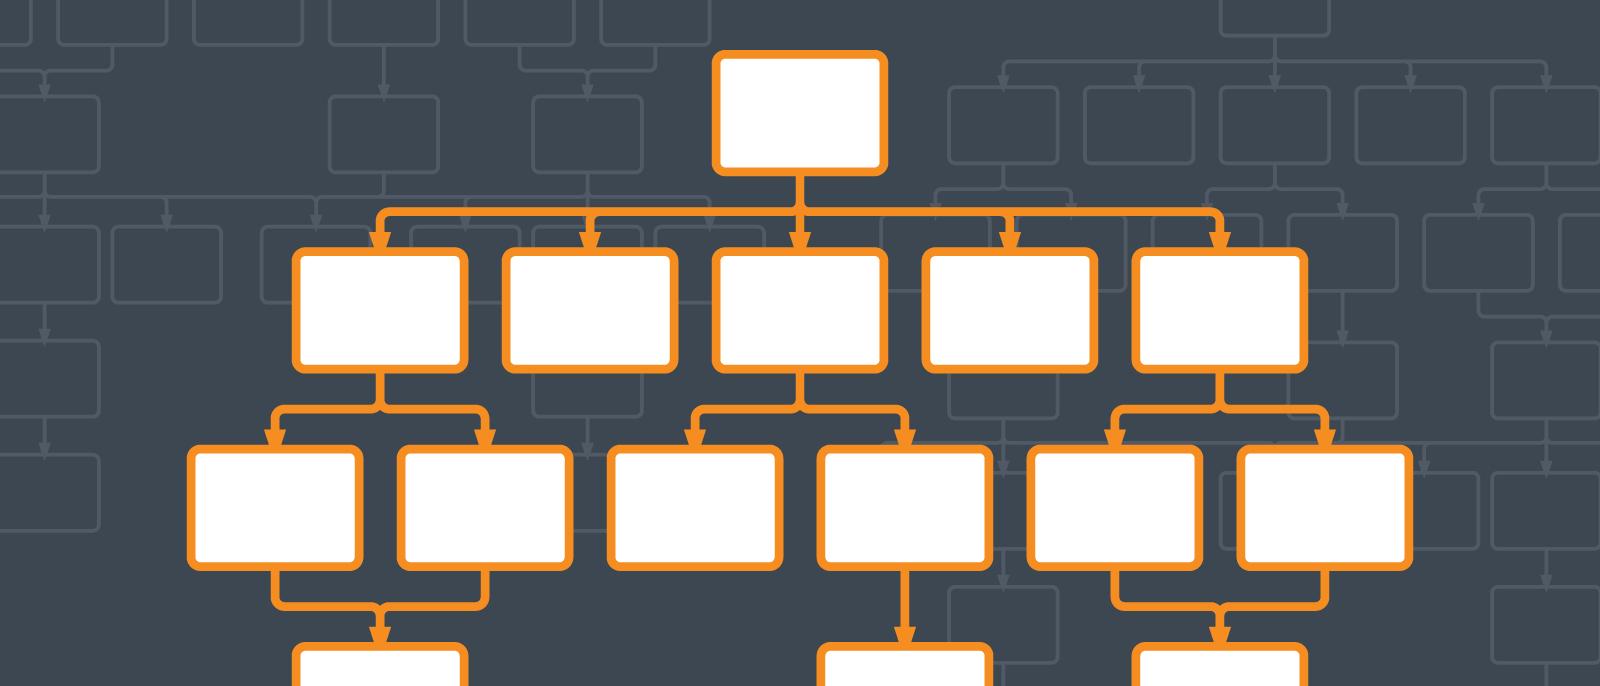 How To Insert Diagrams In Google Docs | Lucidchart Blog within Er Diagram Google Docs